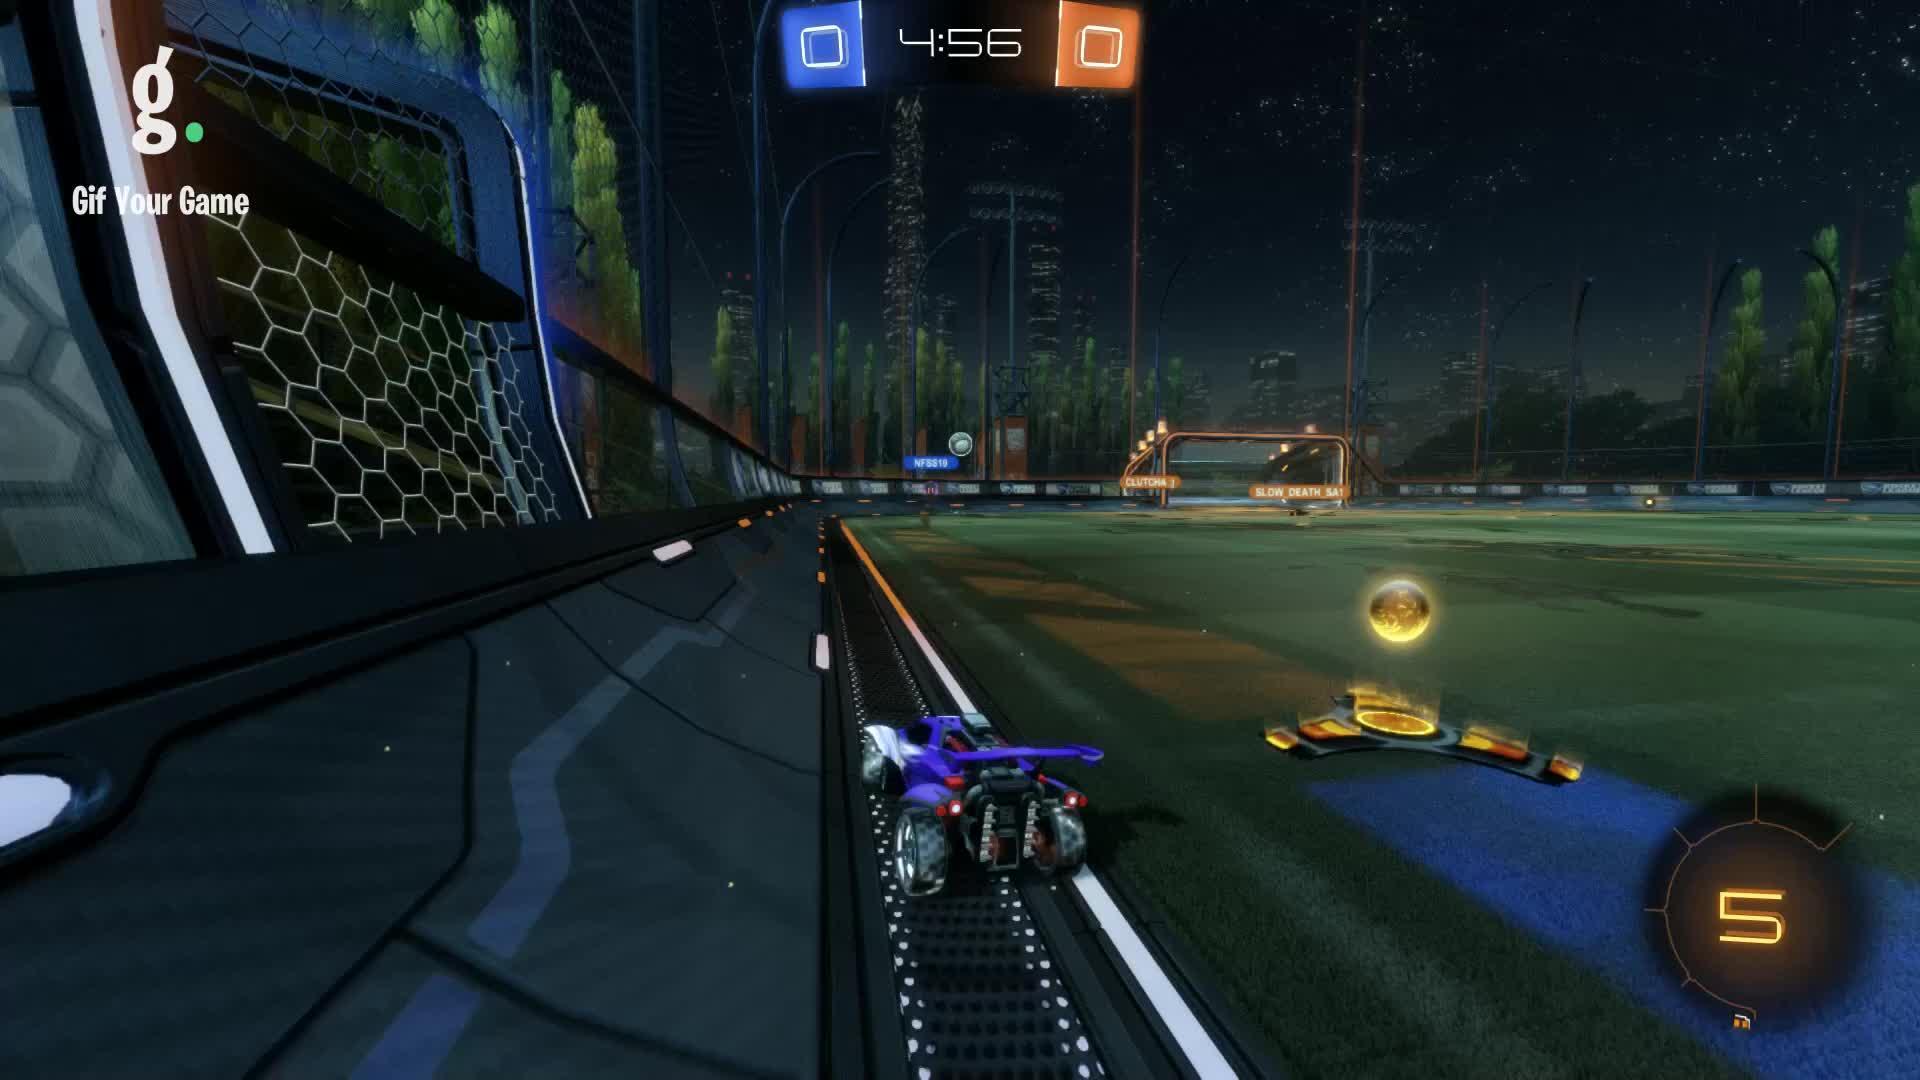 Gif Your Game, GifYourGame, Goal, Rocket League, RocketLeague, Sepi, Goal 1: Sepi GIFs